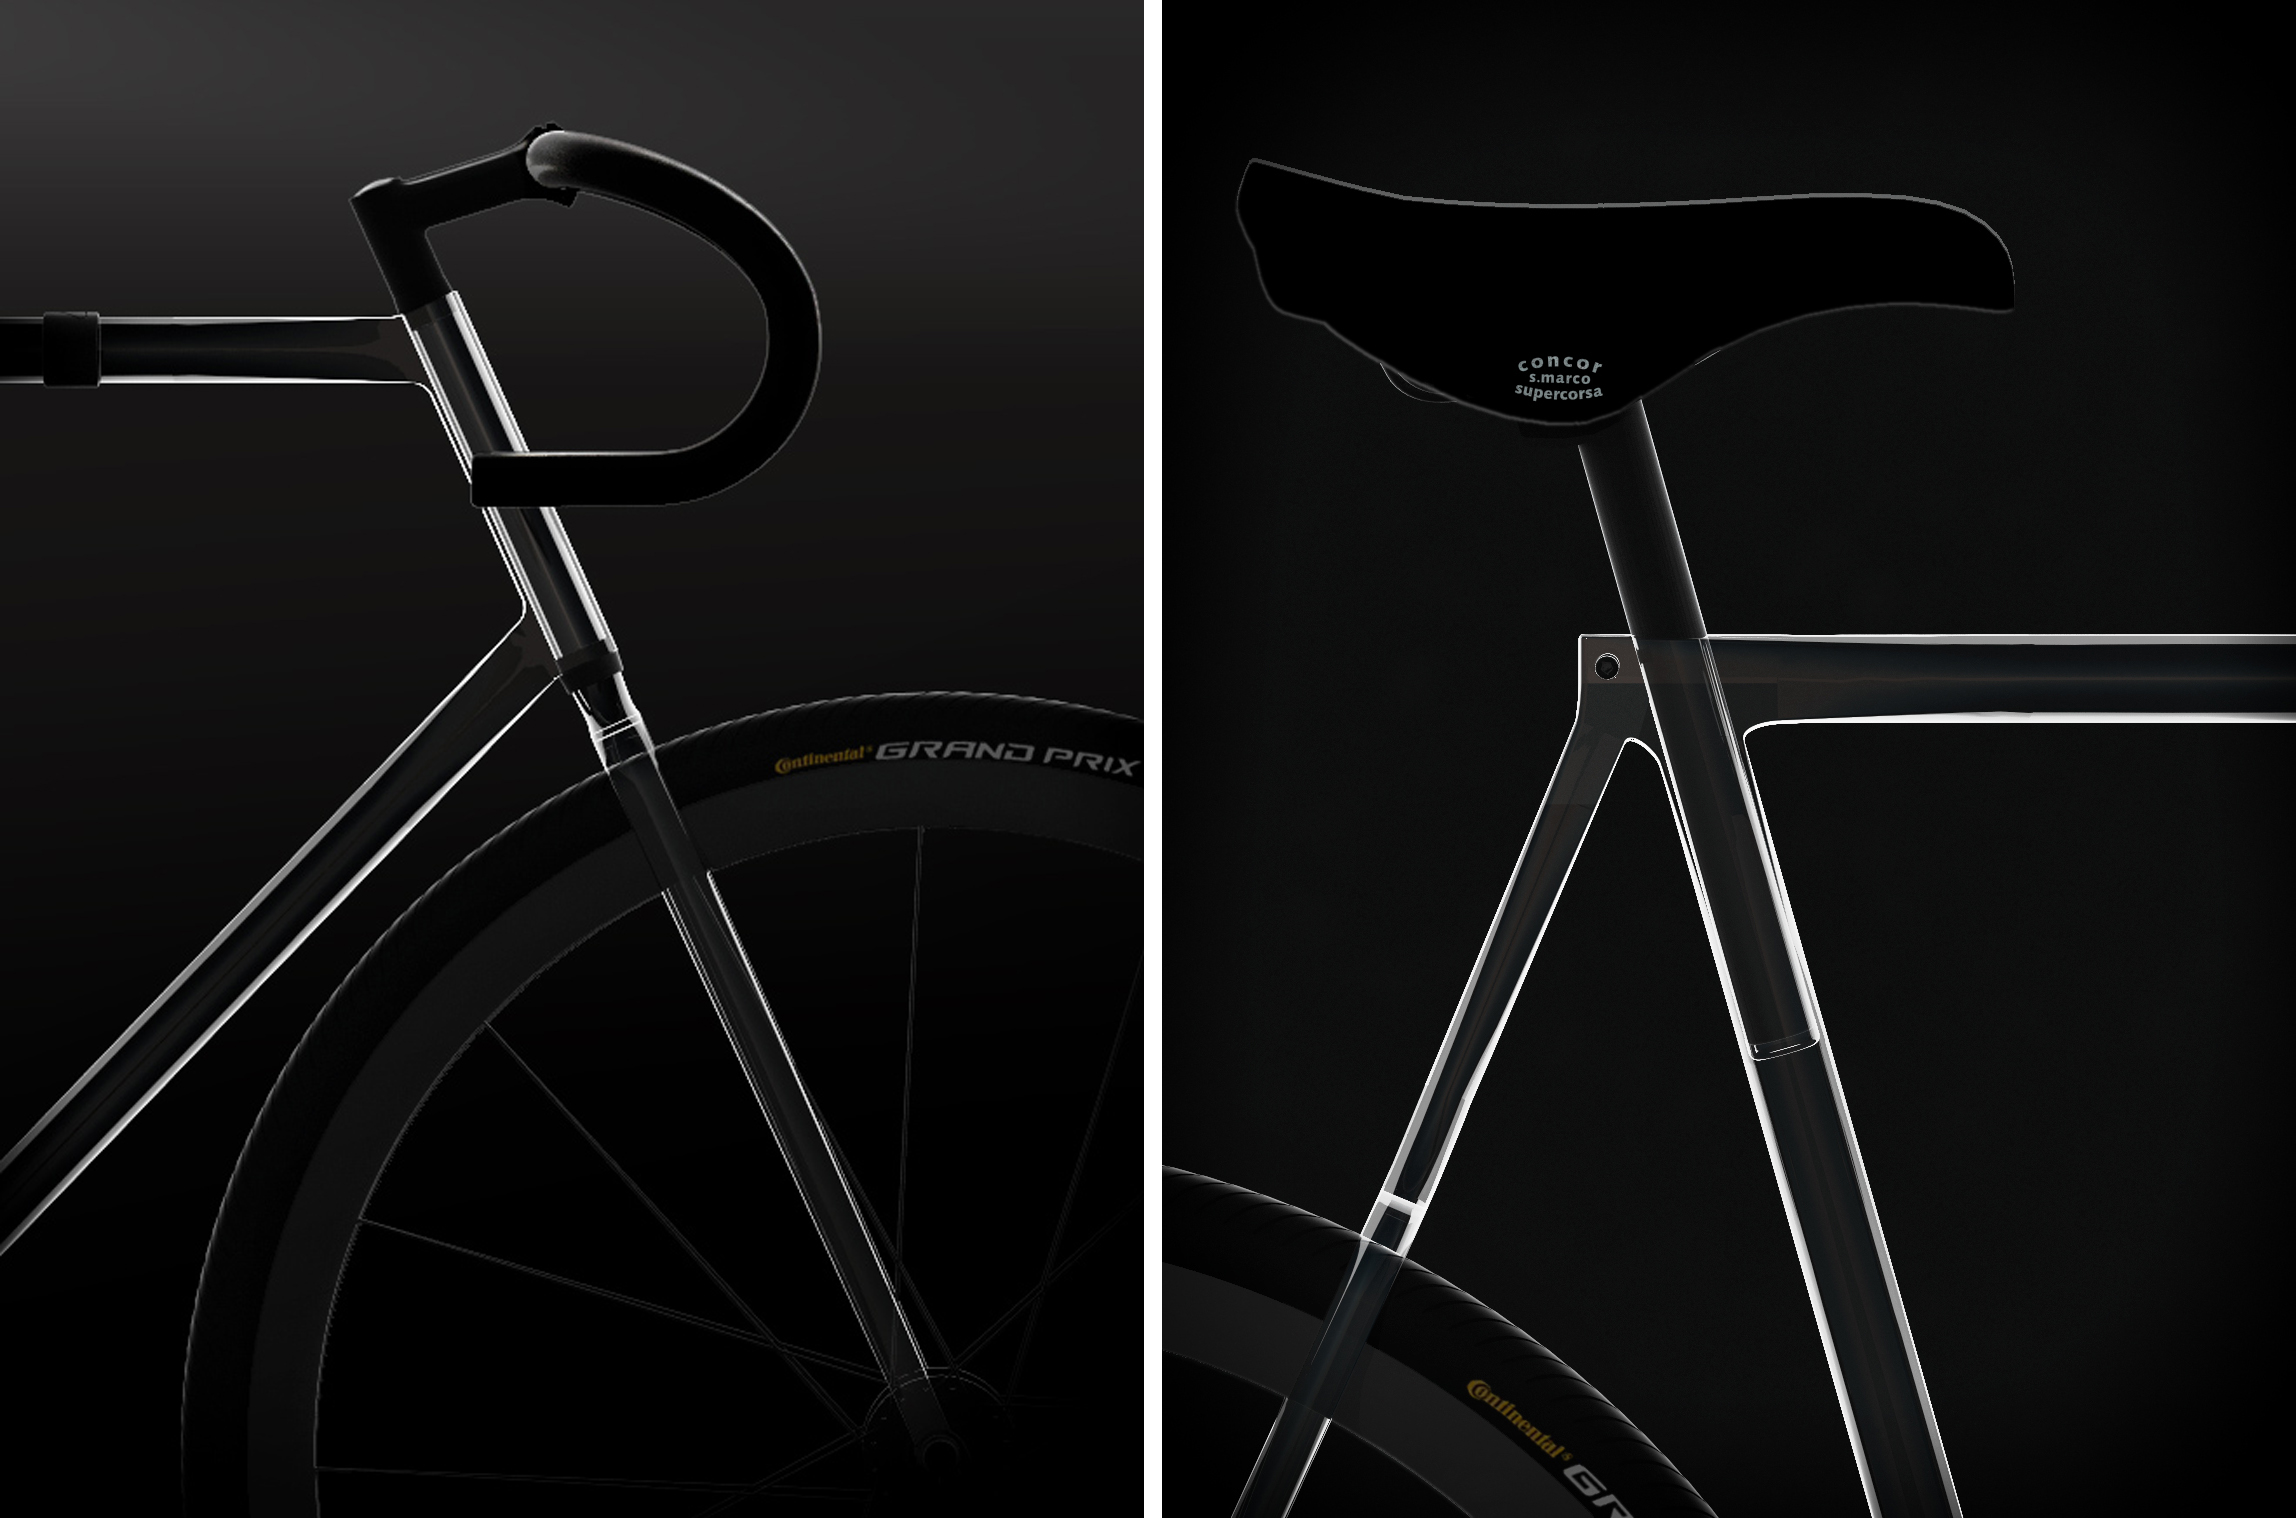 designaffairs Clarity Bike